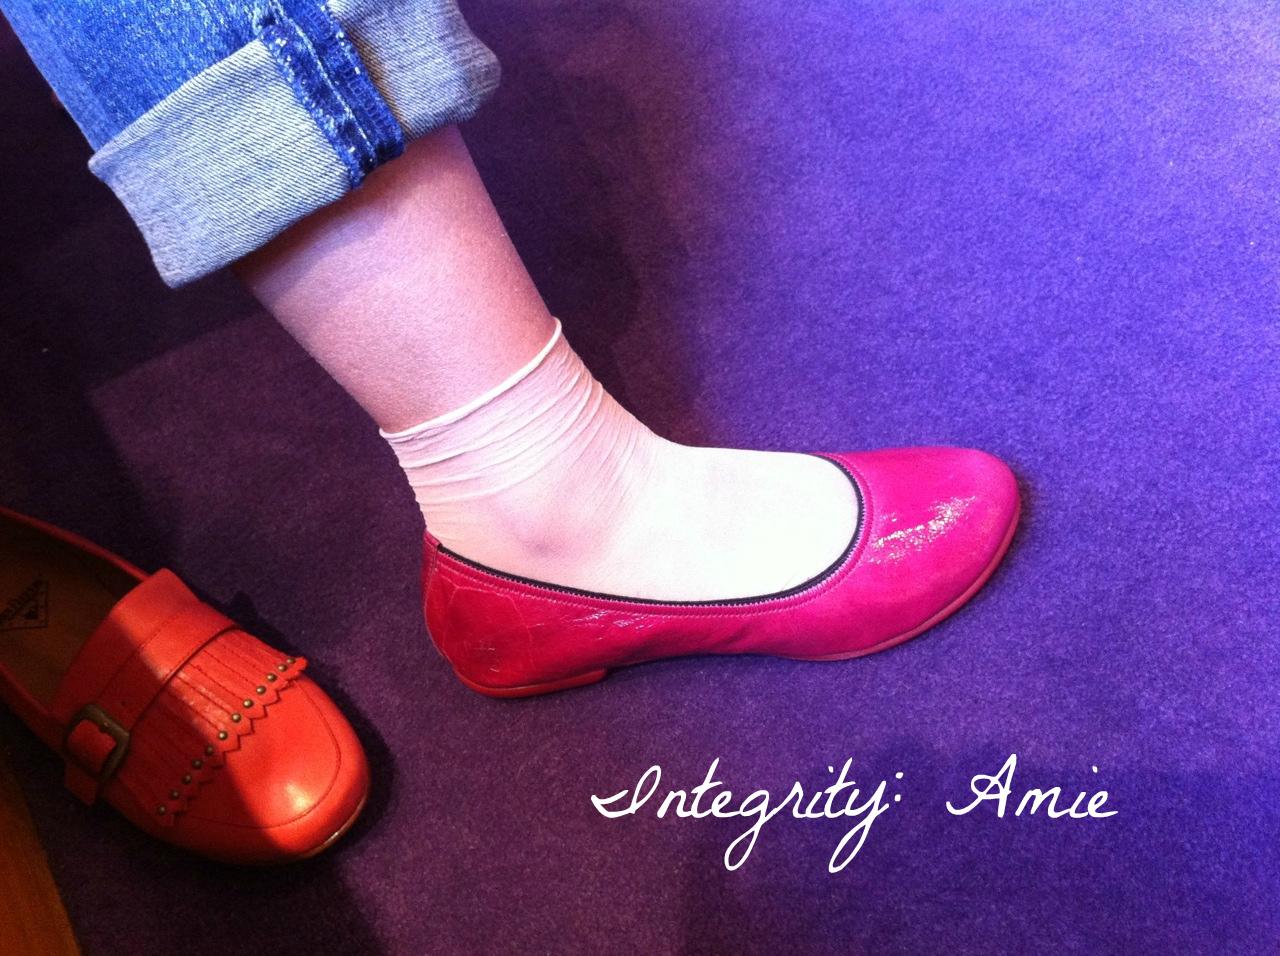 Integrity: Amie